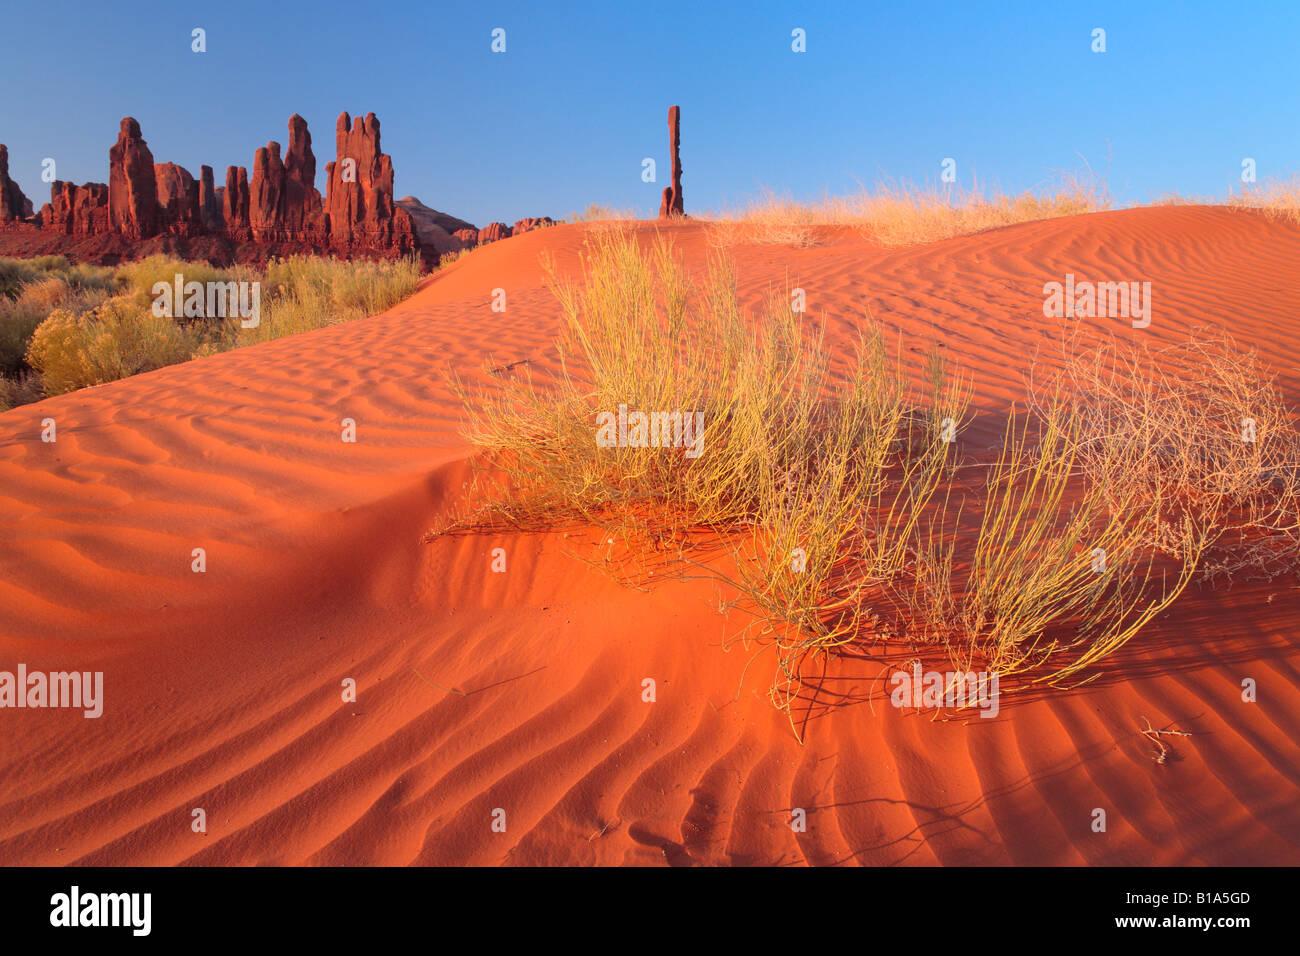 Sand dunes near Yei-bi-Chai rocks (Totem Poles) in Monument Valley, Arizona - Stock Image